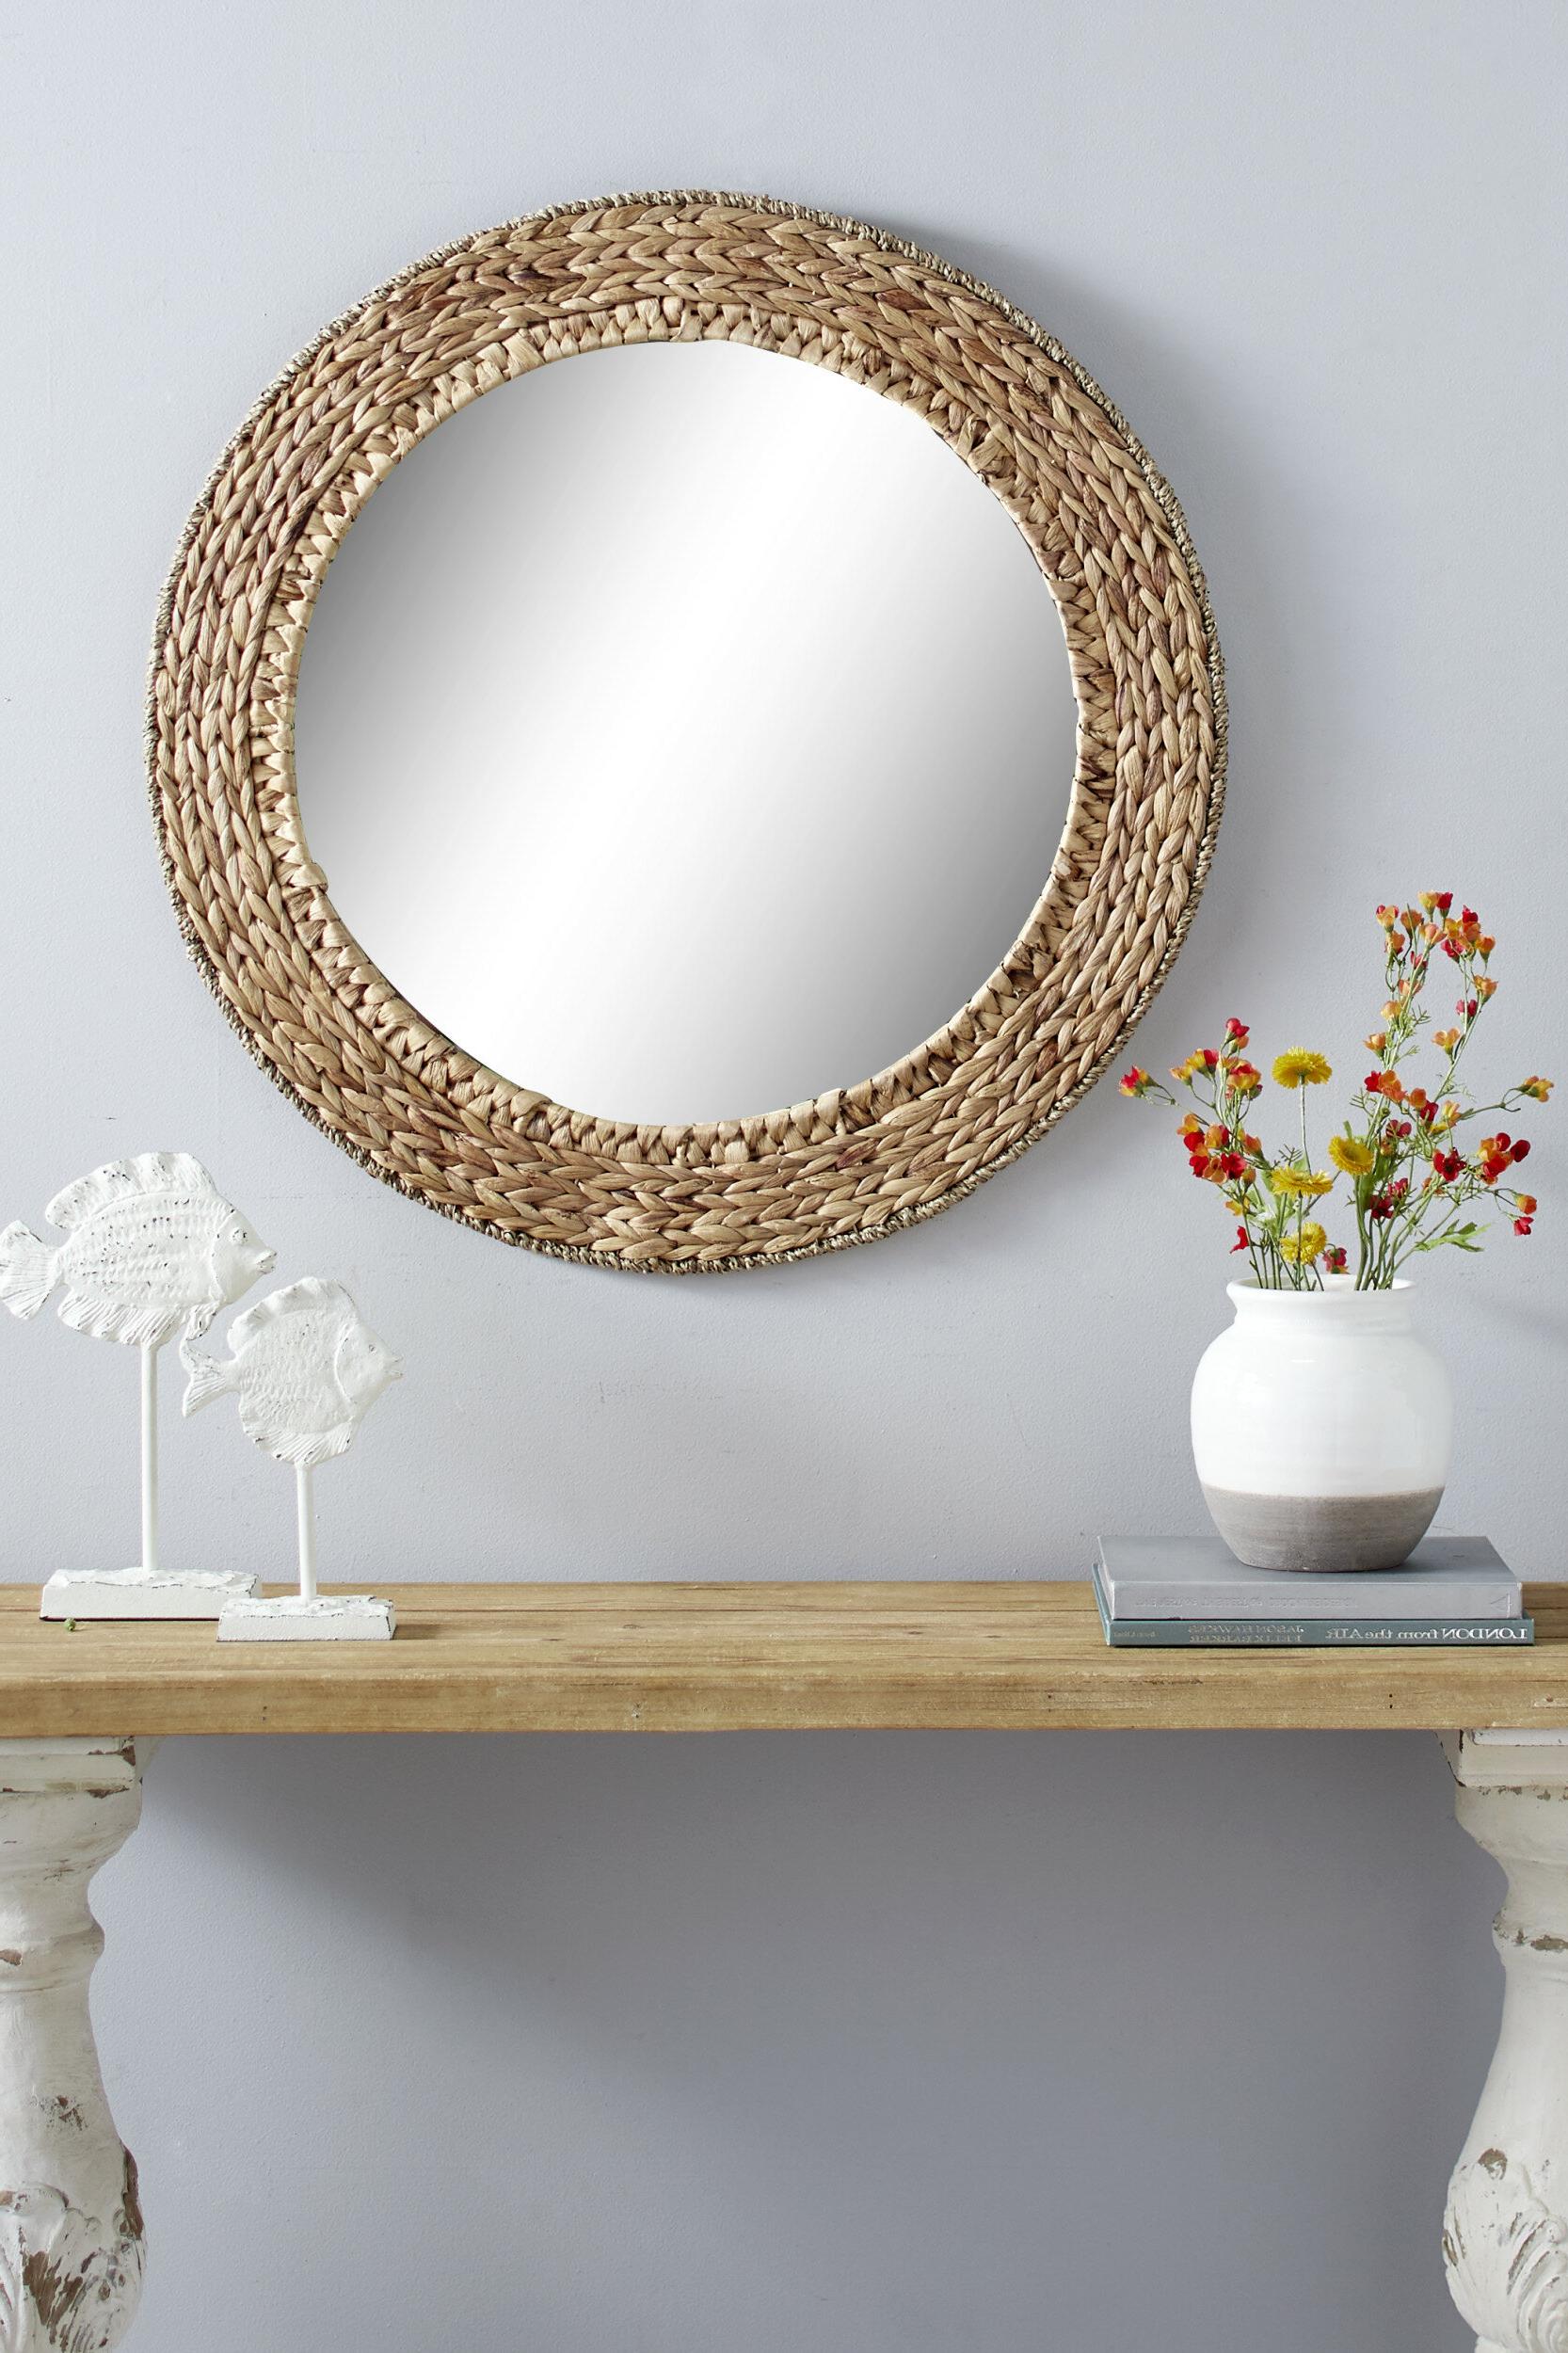 Well Known Bartolo Accent Mirrors Regarding Chiara Round Handmade Wicker Rustic Accent Mirror (View 12 of 20)